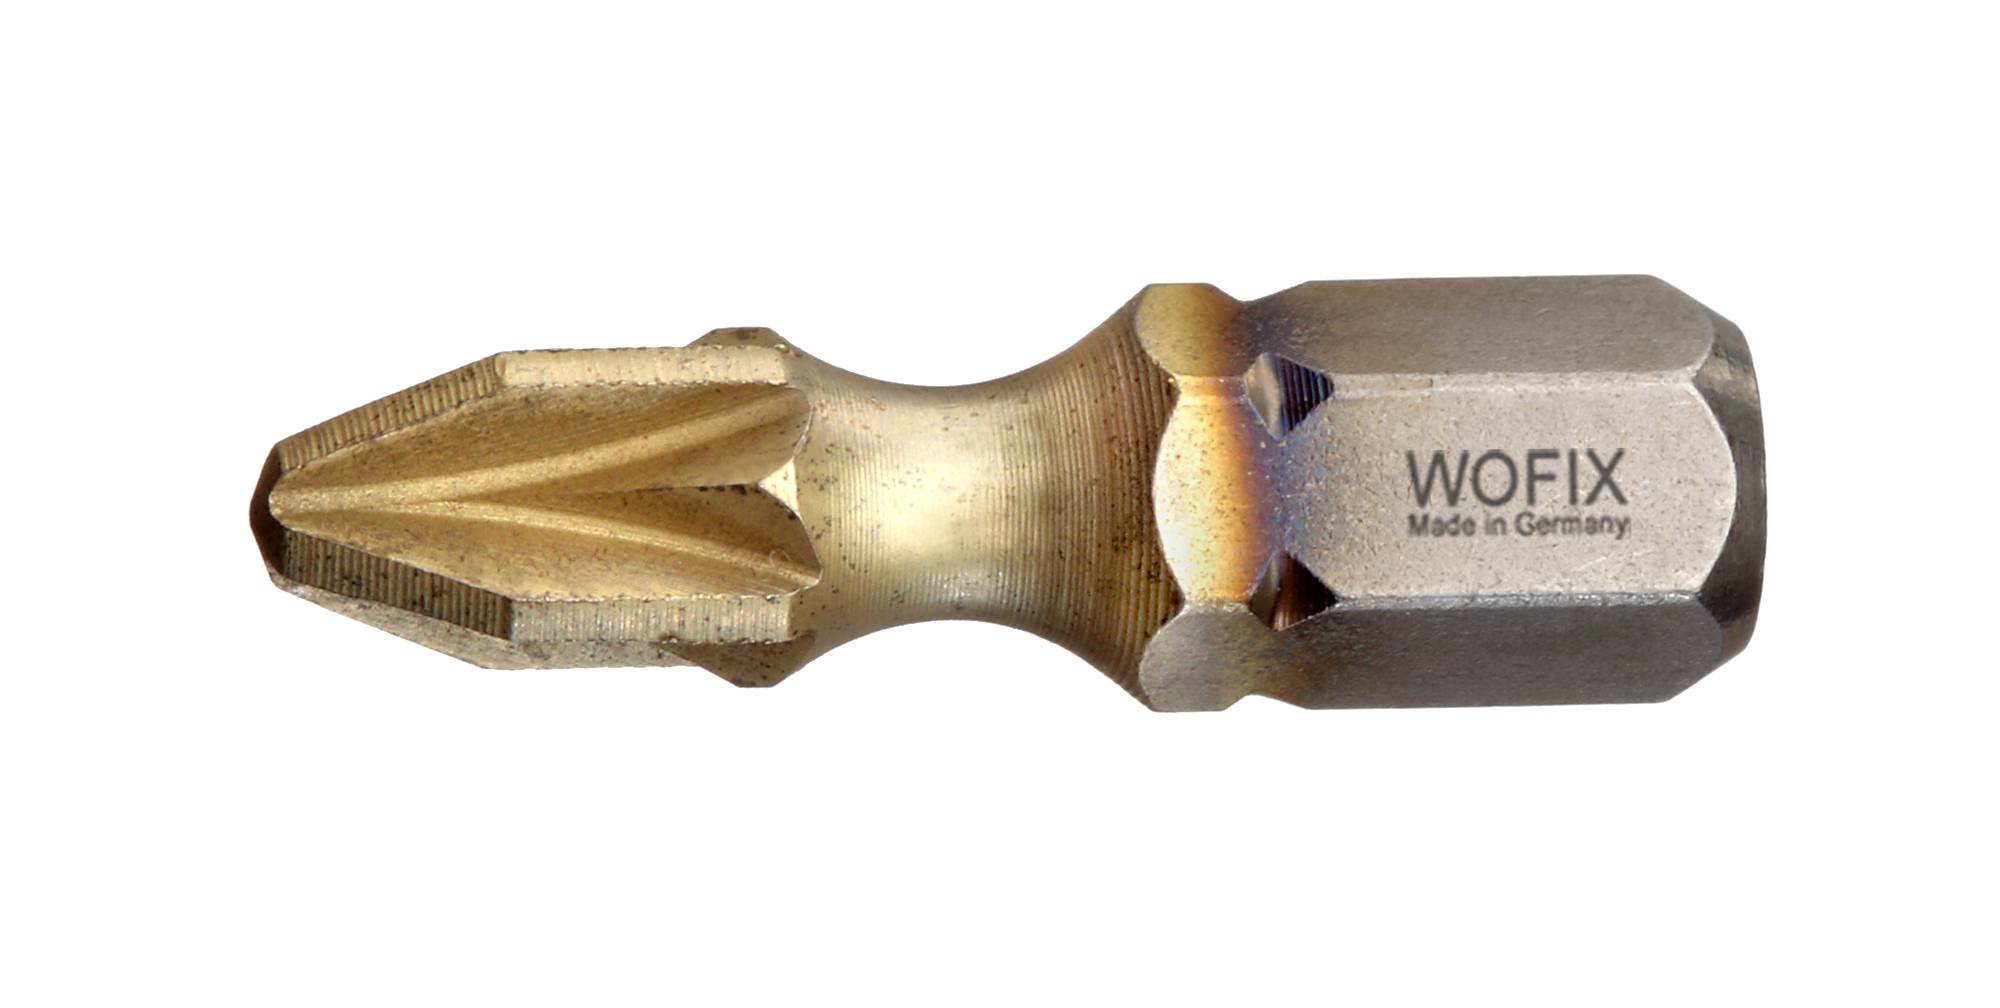 Wofix 7336325 Titanium Zirconium Pozidrive bit - PZ3 x 25 mm